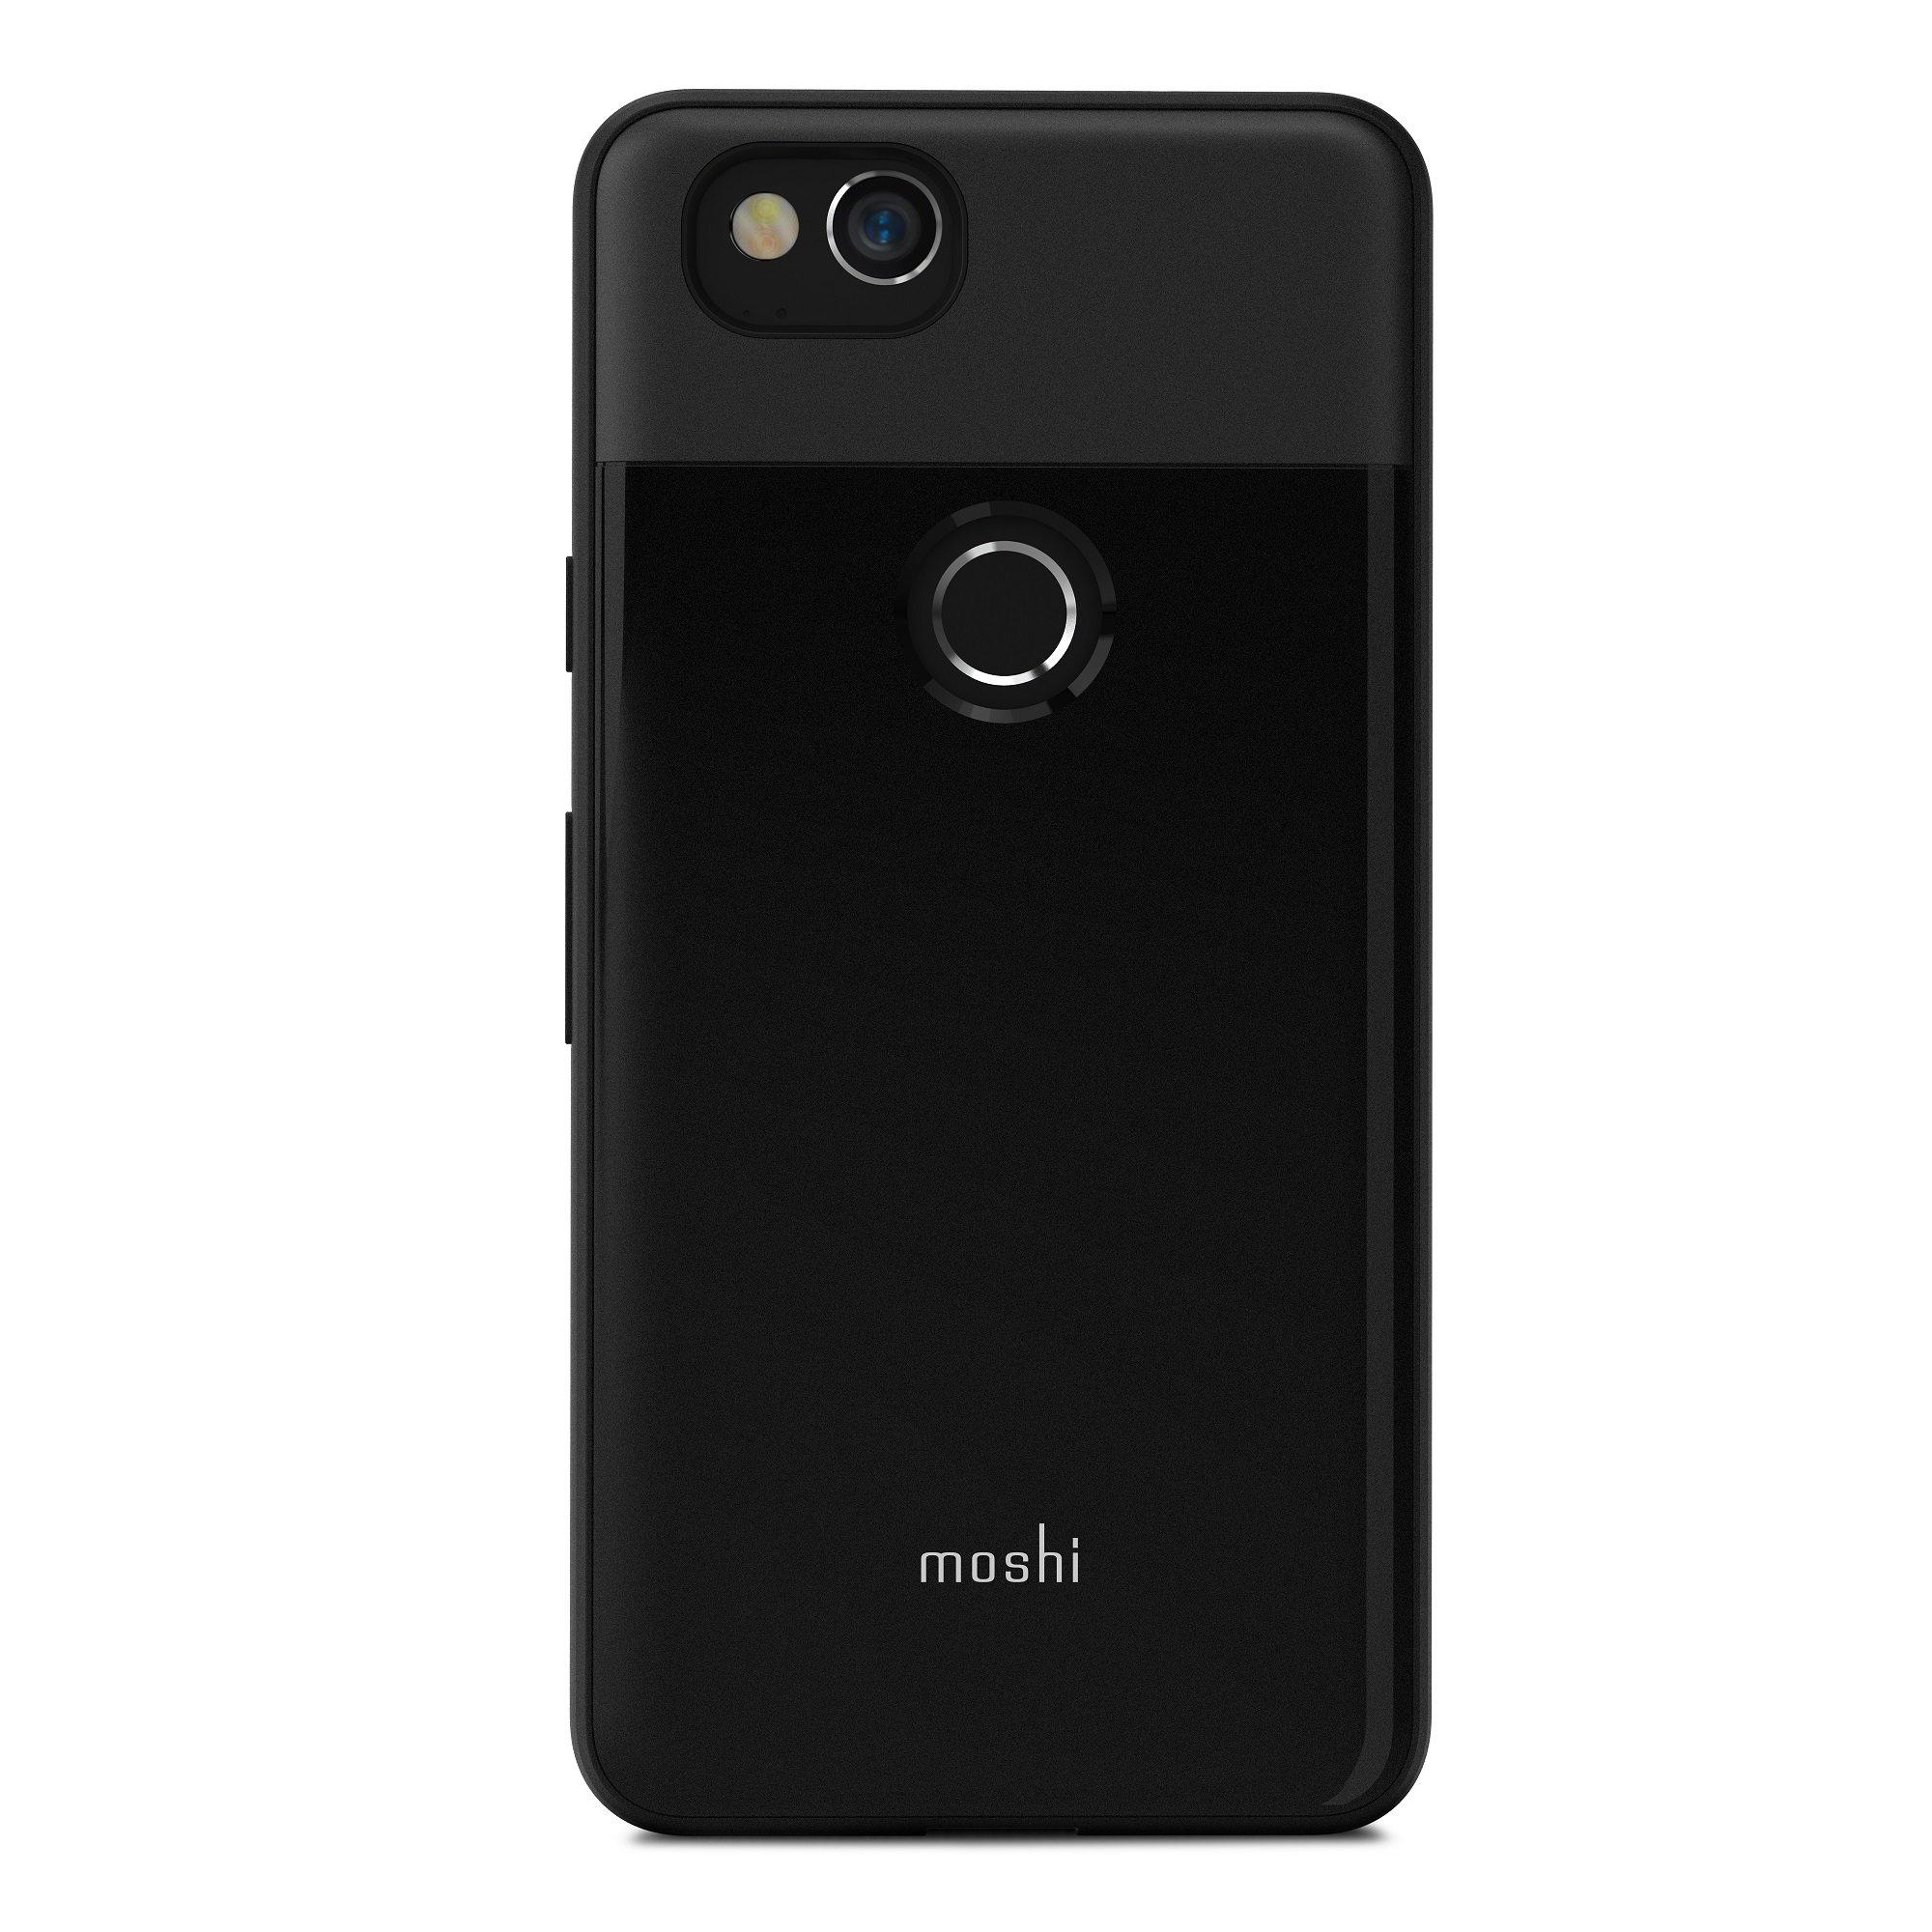 Moshi Vitros Googleピクセル2  - 透明ケース99MO106002メトロブラック